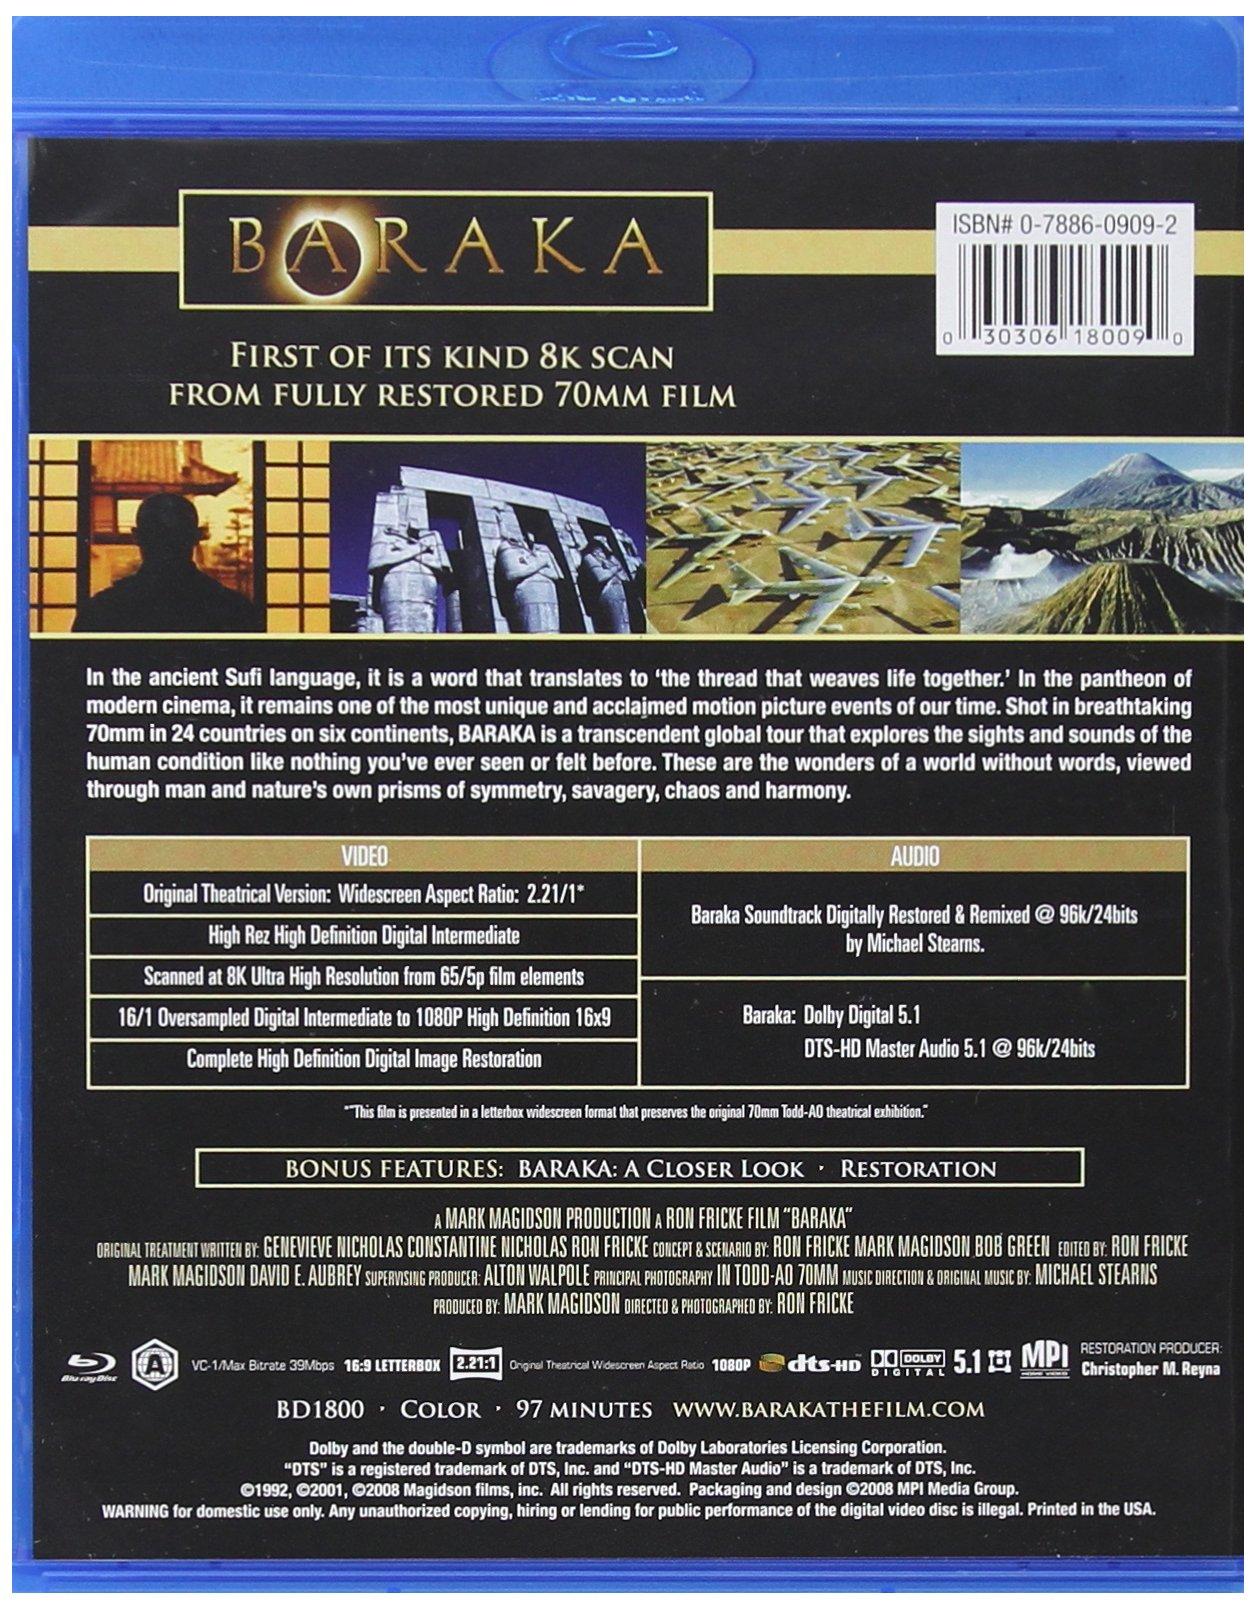 Baraka: A World Beyond Words